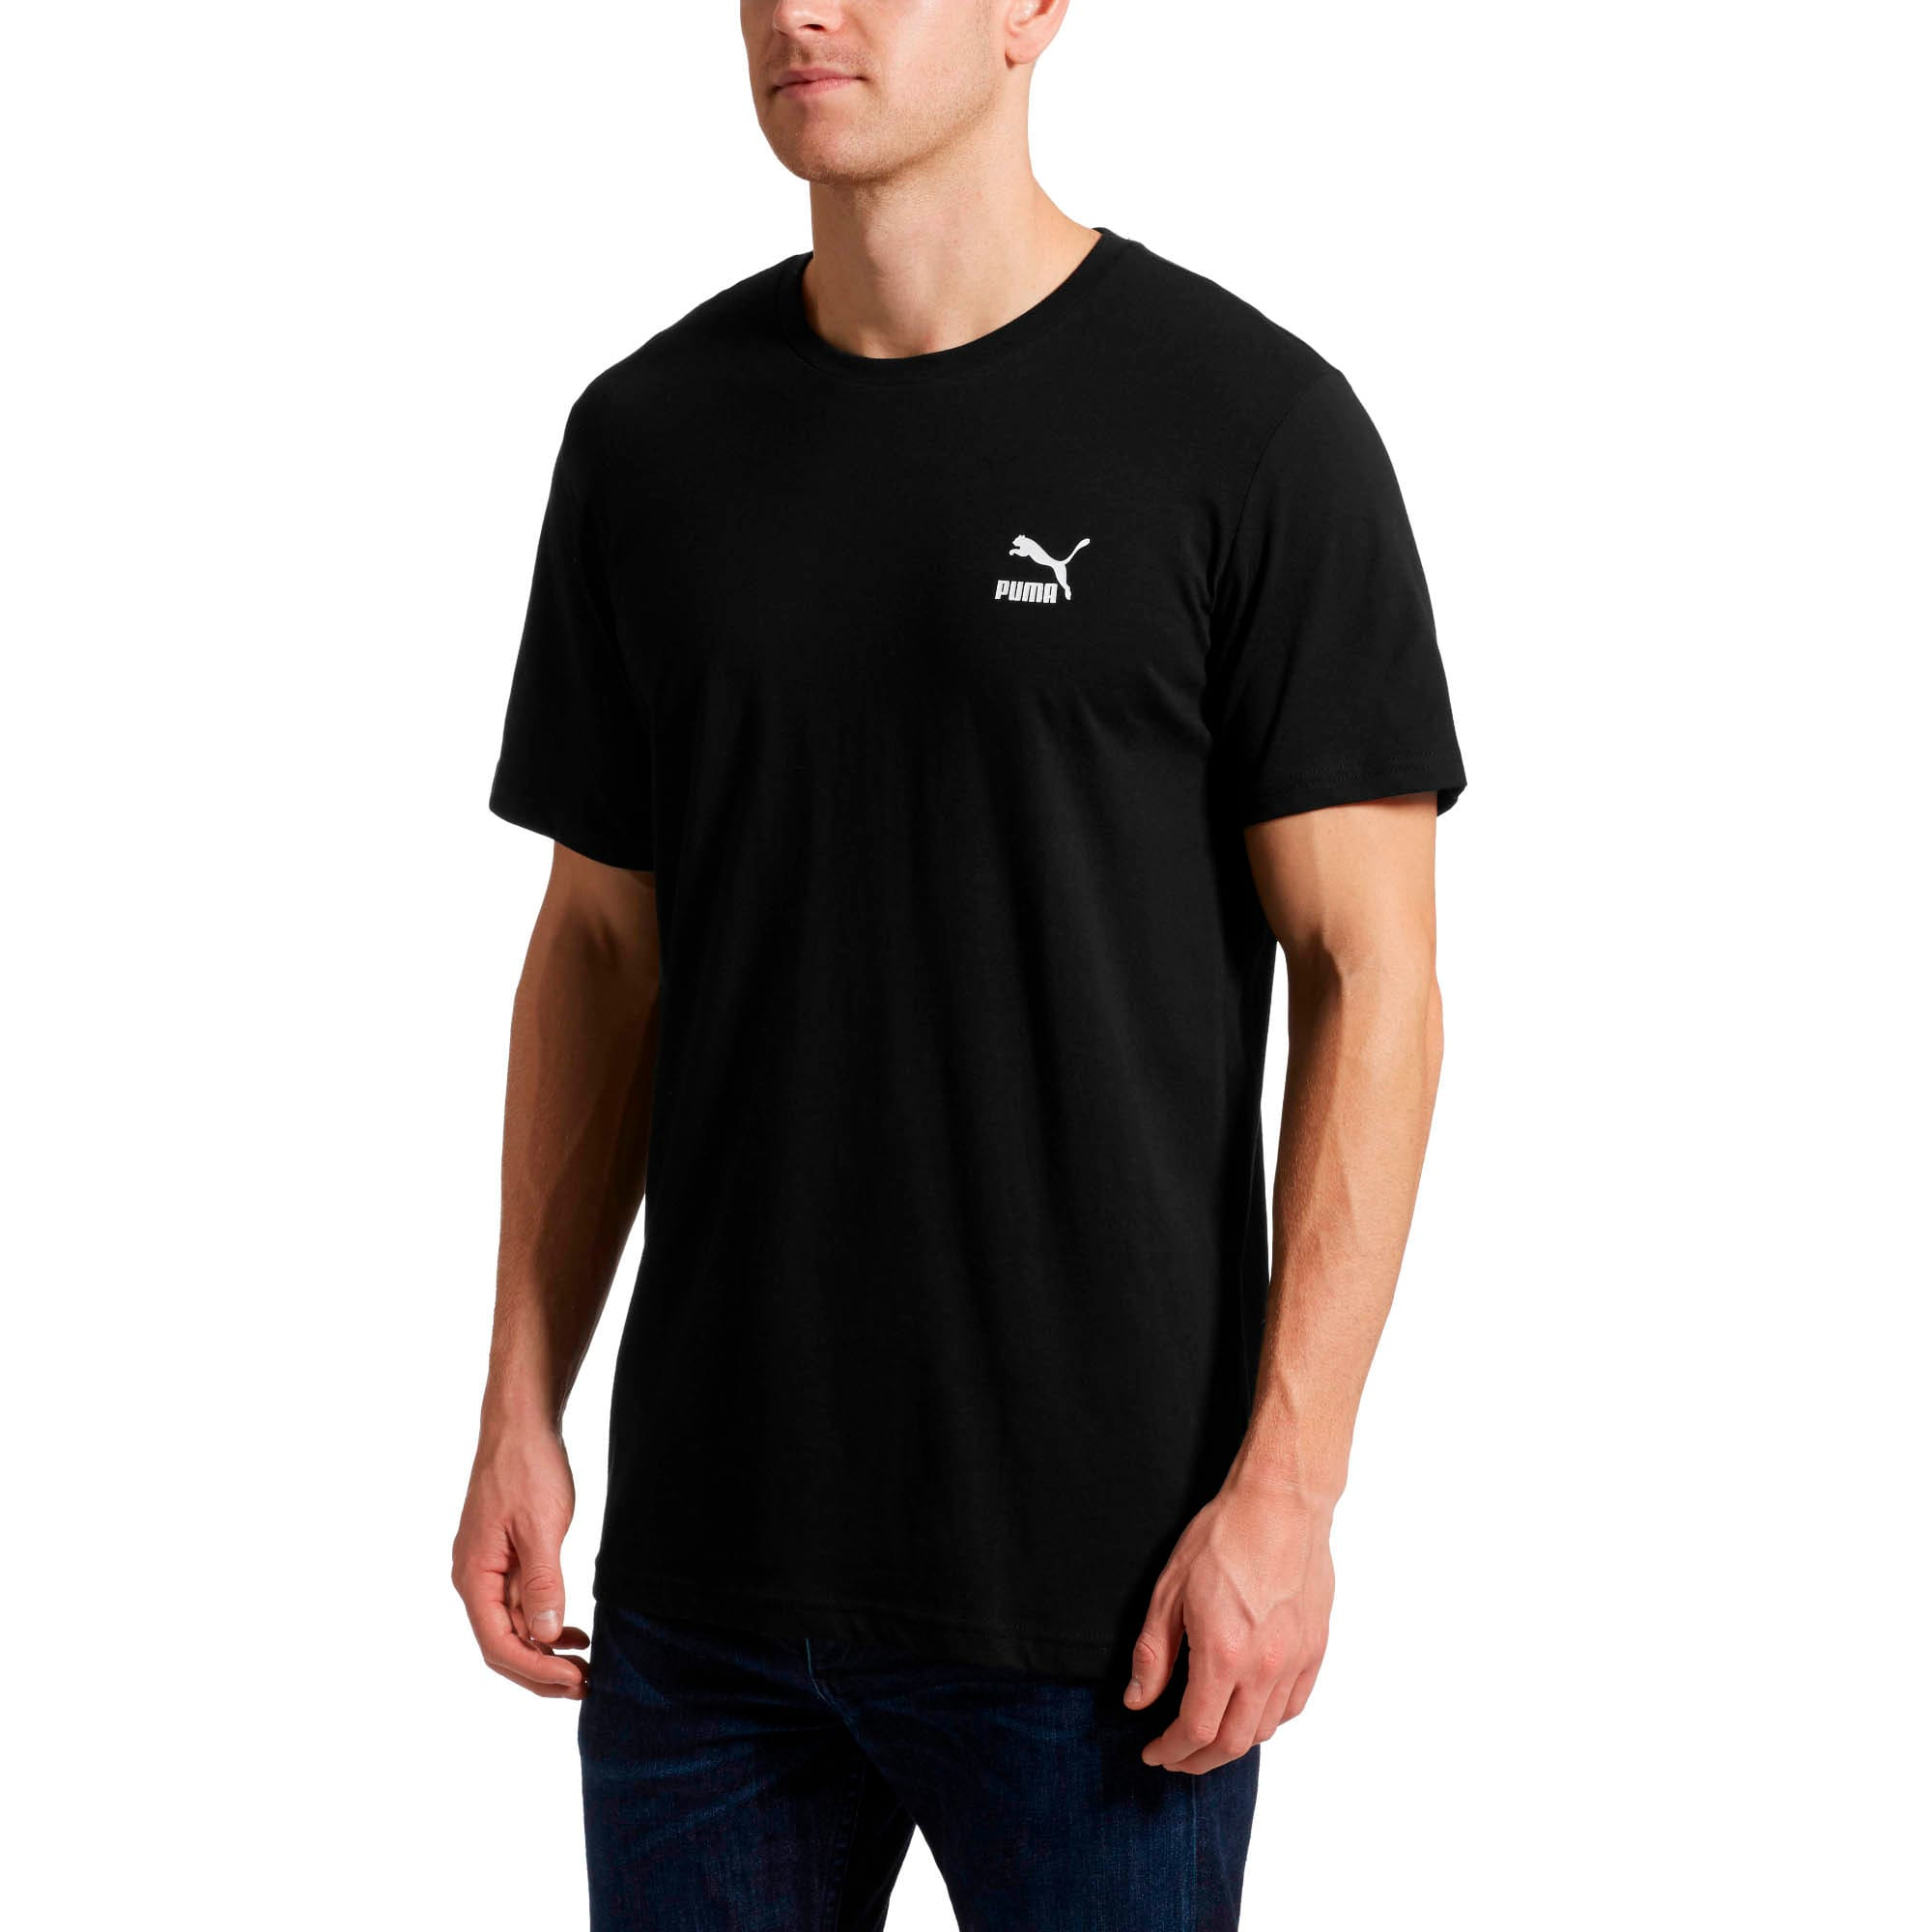 Thumbnail 2 of Graphic Downtown Label T-Shirt, Cotton Black, medium